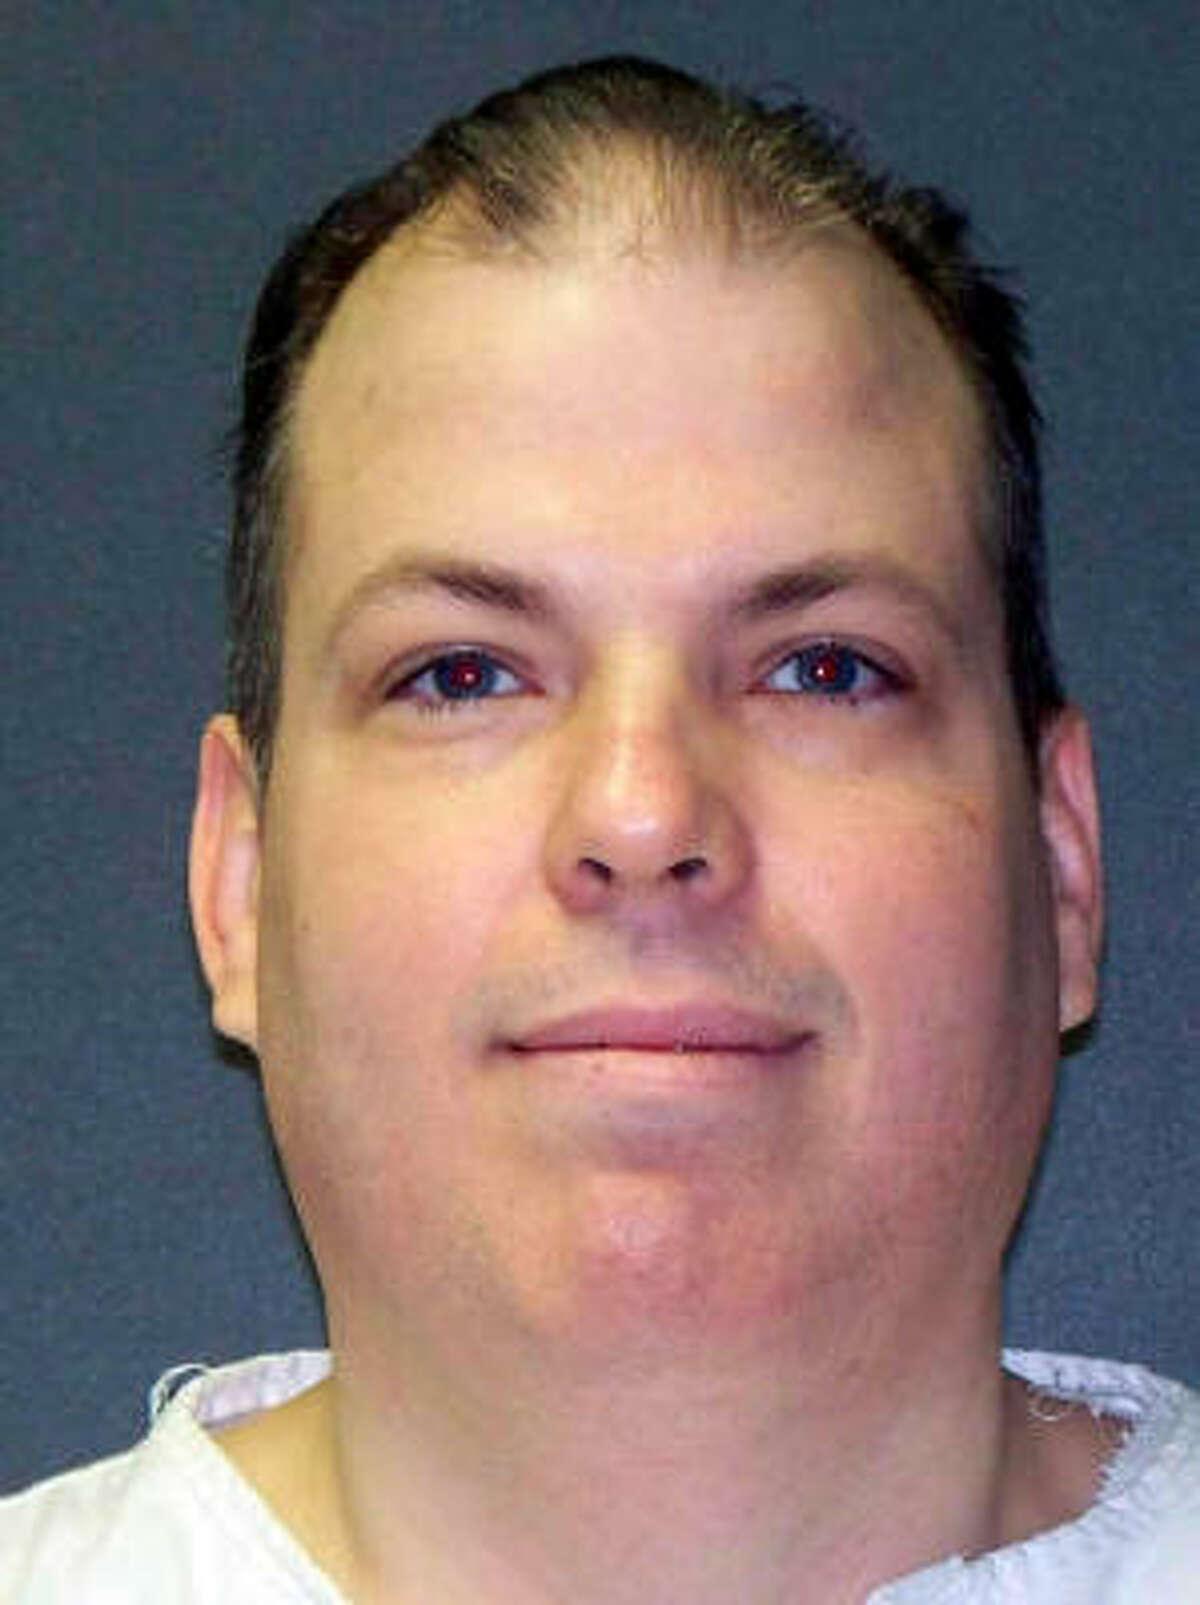 Karl Eugene Chamberlain was convicted of fatally shooting Dallas resident Felecia Prechtl, 30, more than a decade ago.